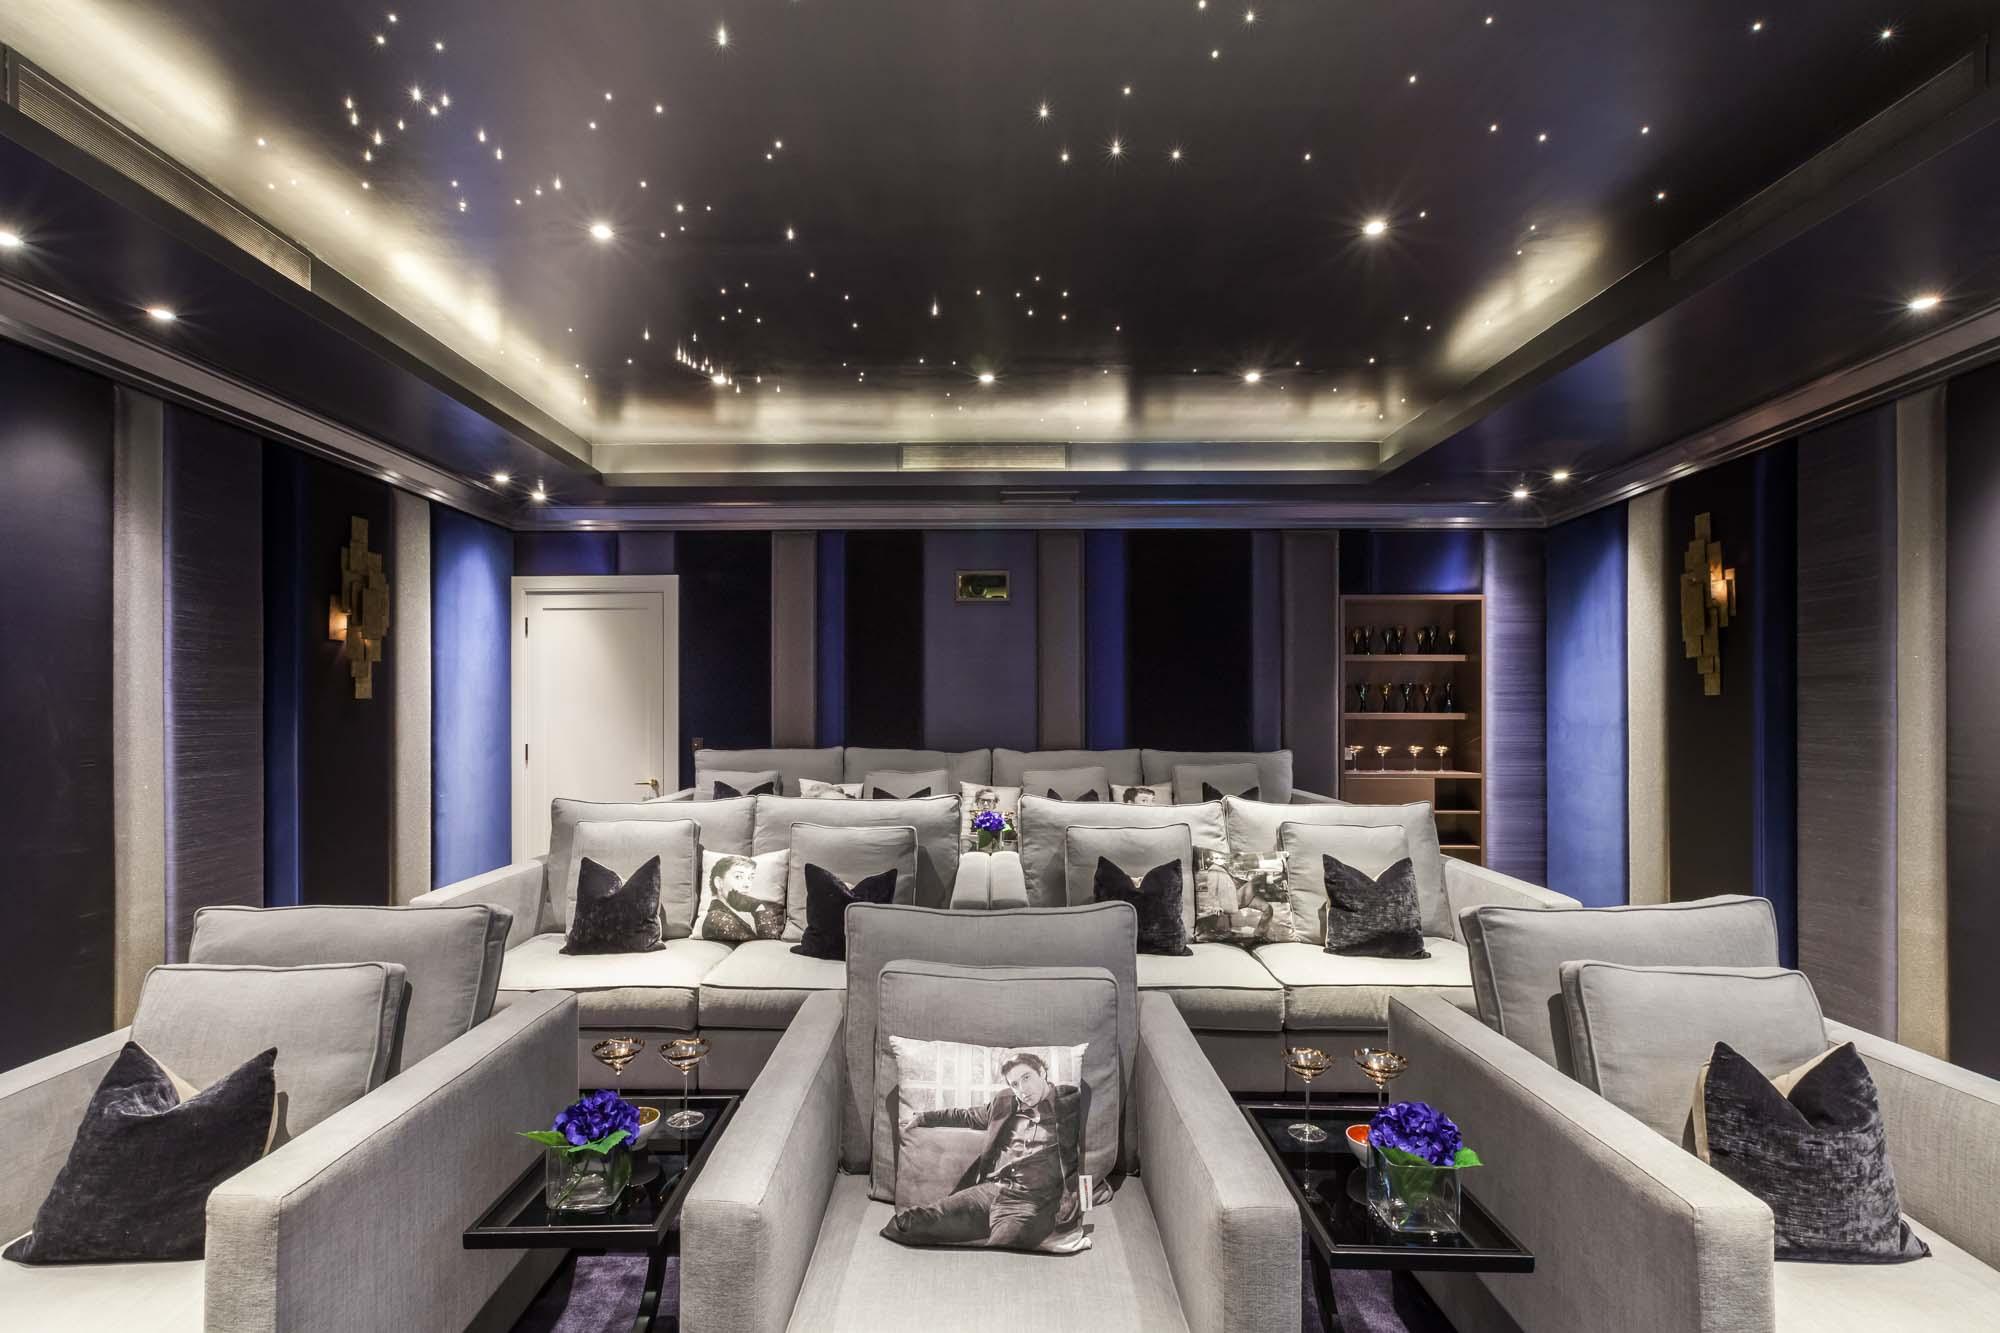 jonathan bond photography, home cinema fabric seating, hyde park, london